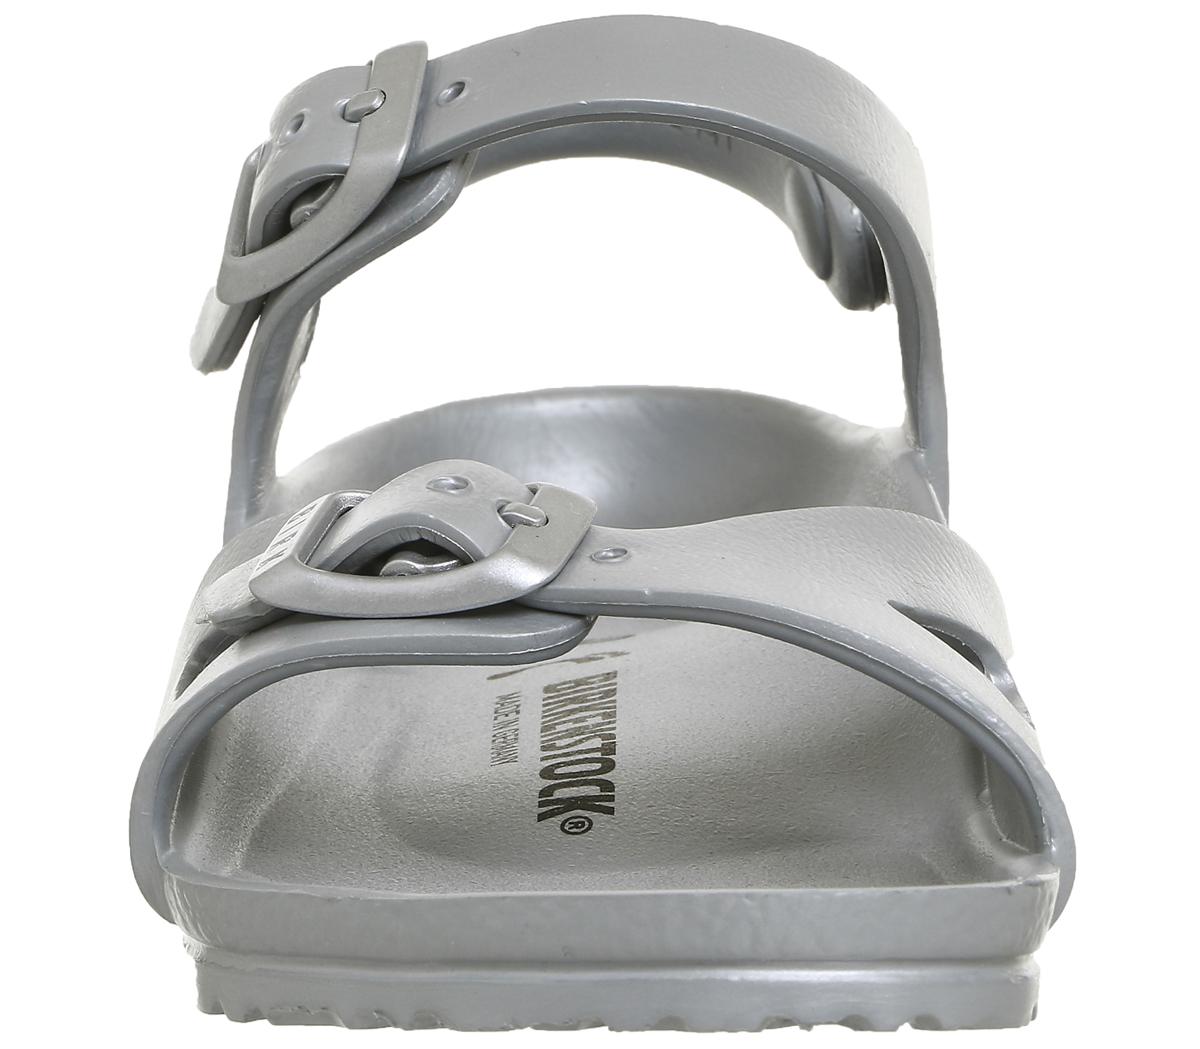 SENTINEL Bambini Birkenstock Rio Eva bambini sandali metallici argento Kids 6275fefa6be